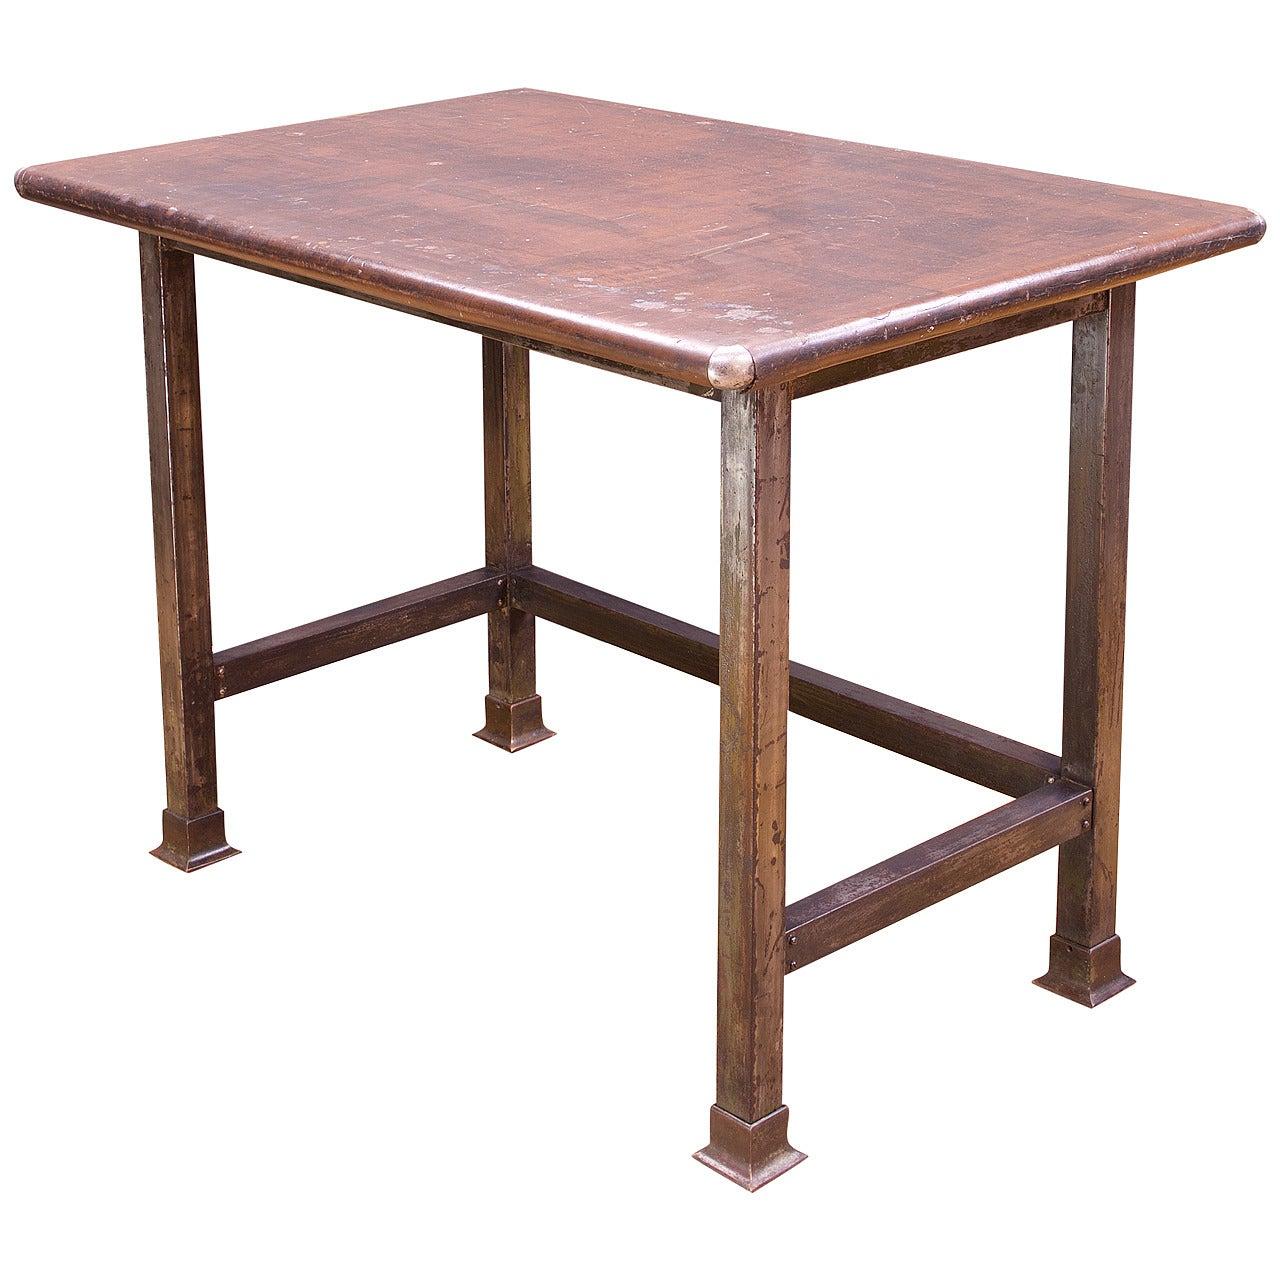 1910s Industrial Rustic Farmhouse Arborists Steel Table Drafting Work Island